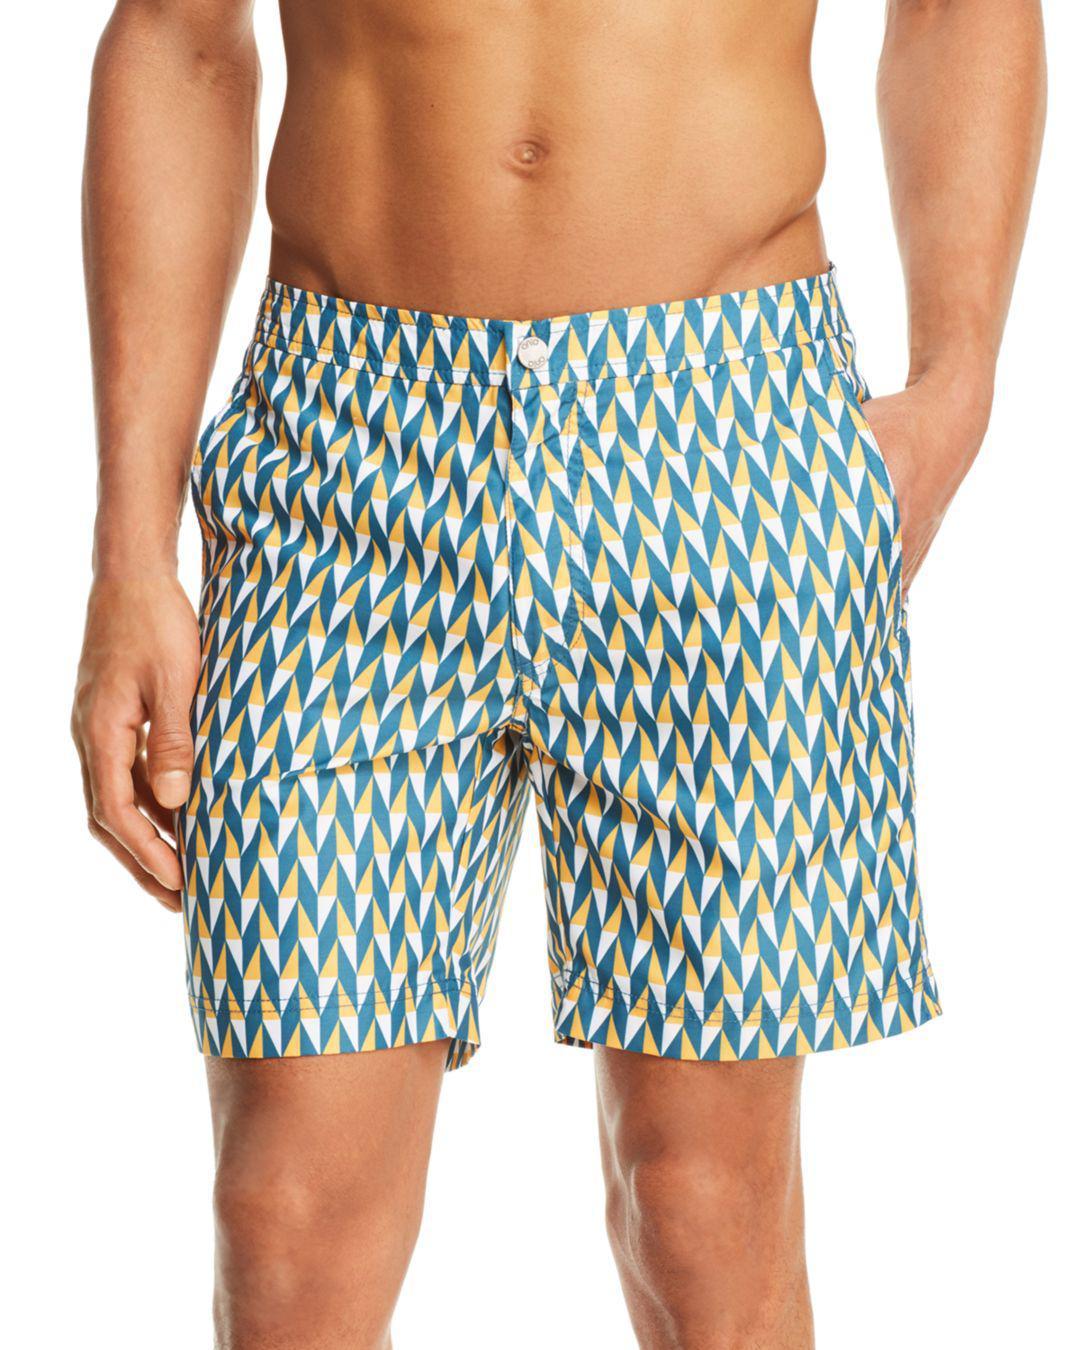 1a9f980495 Lyst - Onia Chevron Swim Trunks in Blue for Men